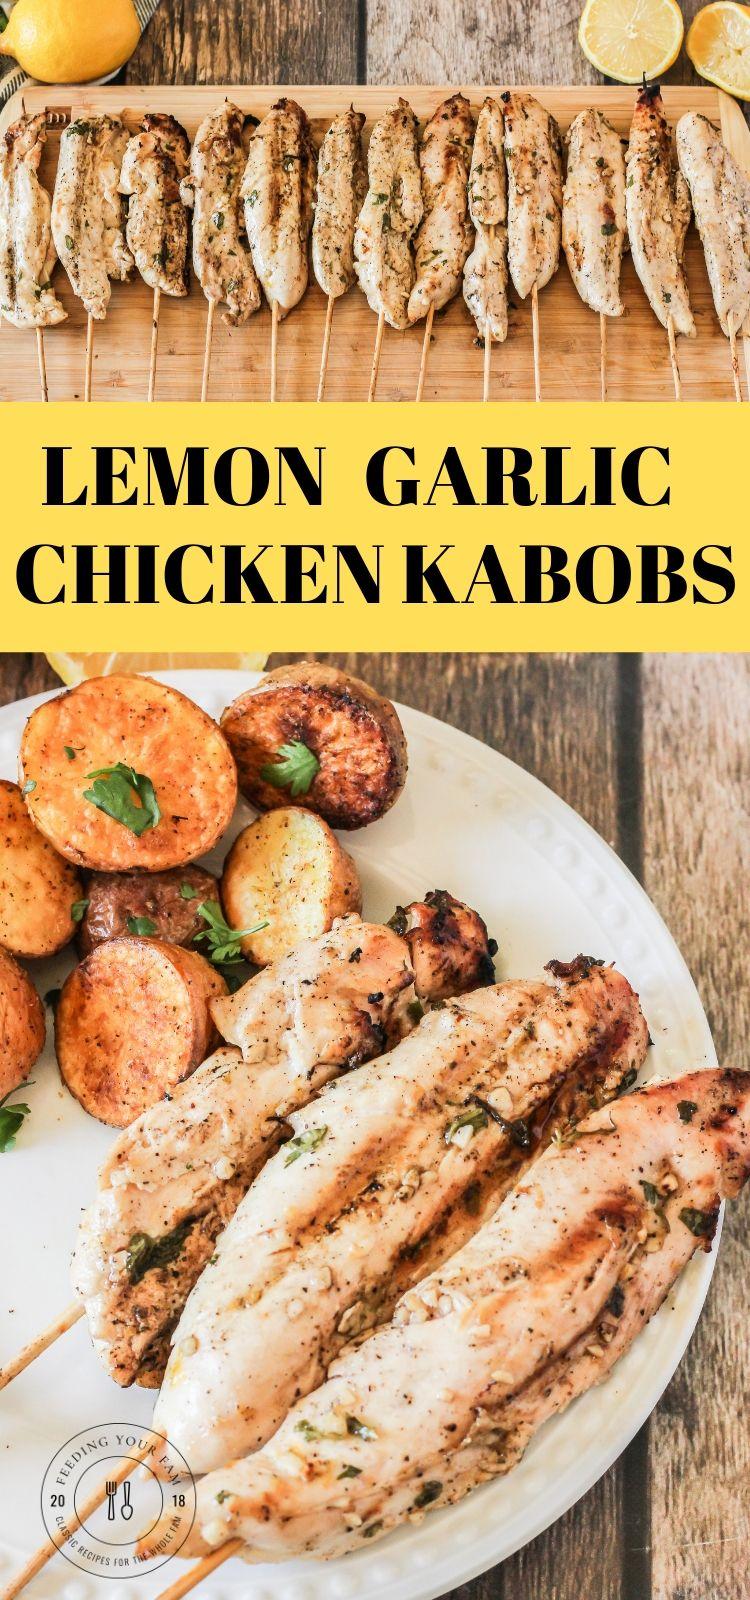 pinterest image of lemon garlic chicken kabobs